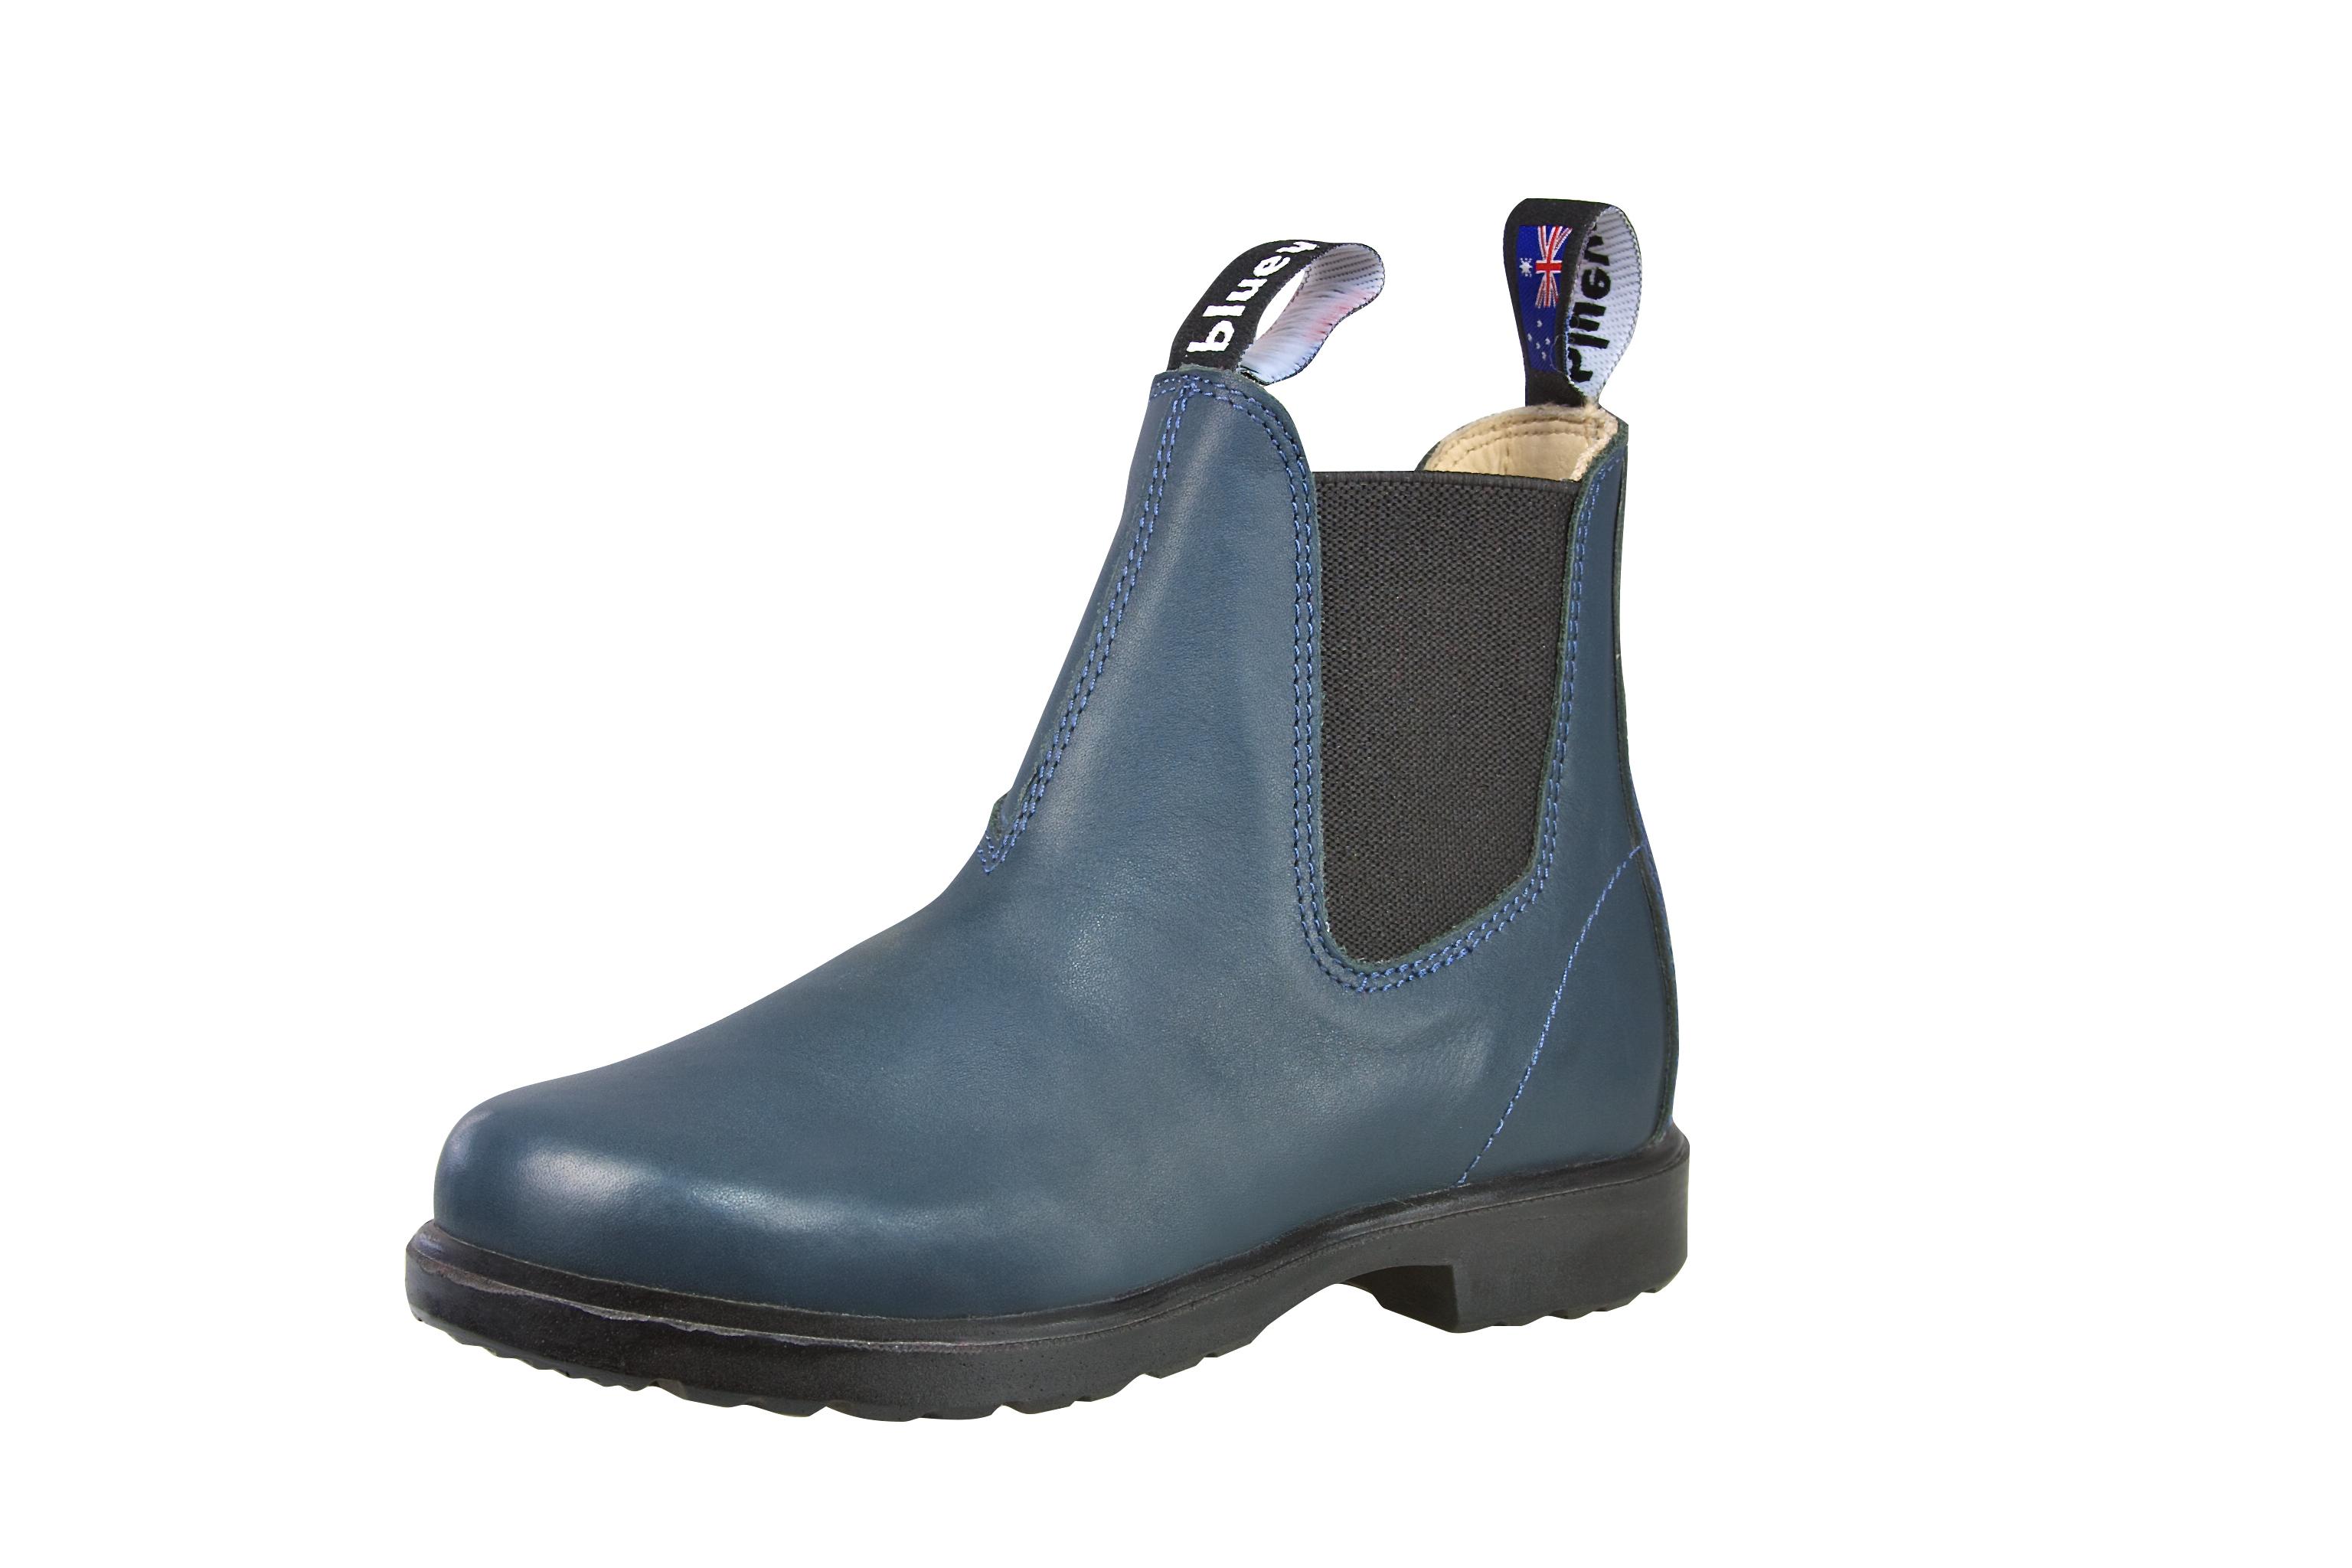 blue heeler family boots jetzt im winterhuder kindersalon. Black Bedroom Furniture Sets. Home Design Ideas